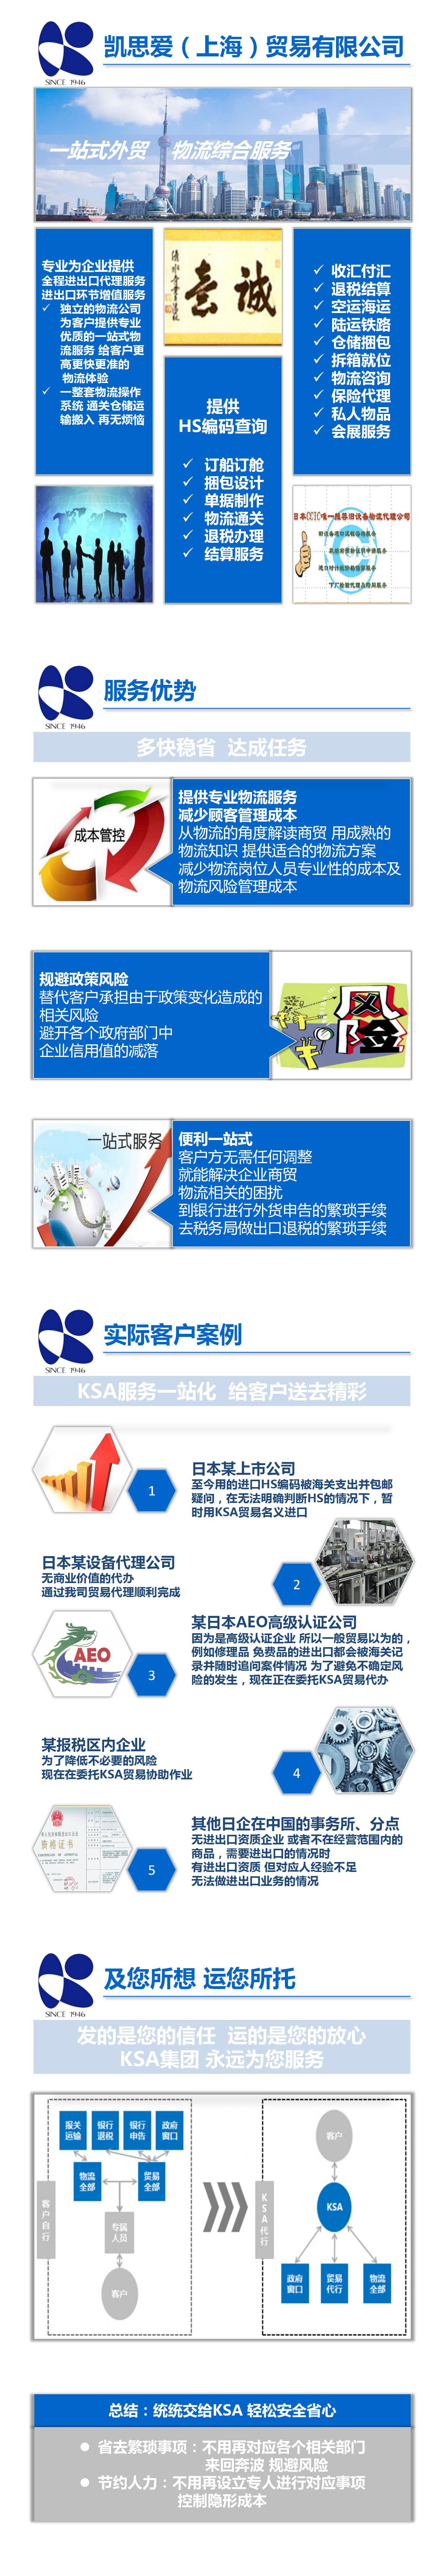 CN贸易简介4P.jpg